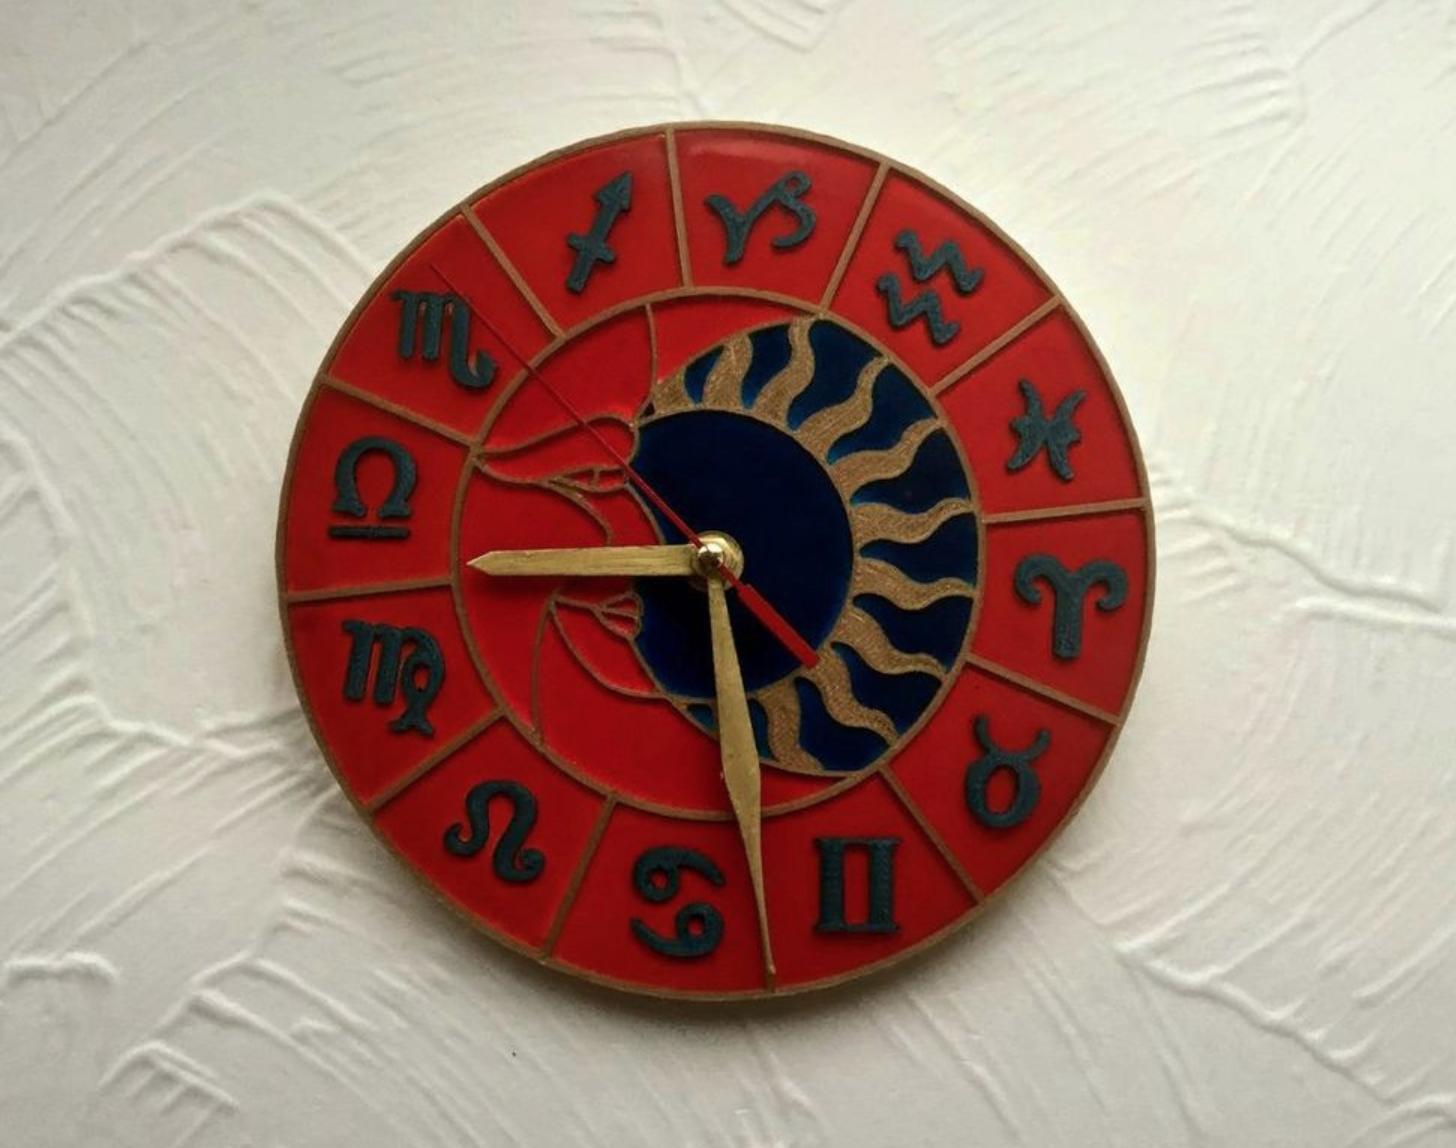 Capture d'écran 2017-12-19 à 18.28.55.png Download free STL file Wall Clock Zodiac Circle • Model to 3D print, TanyaAkinora